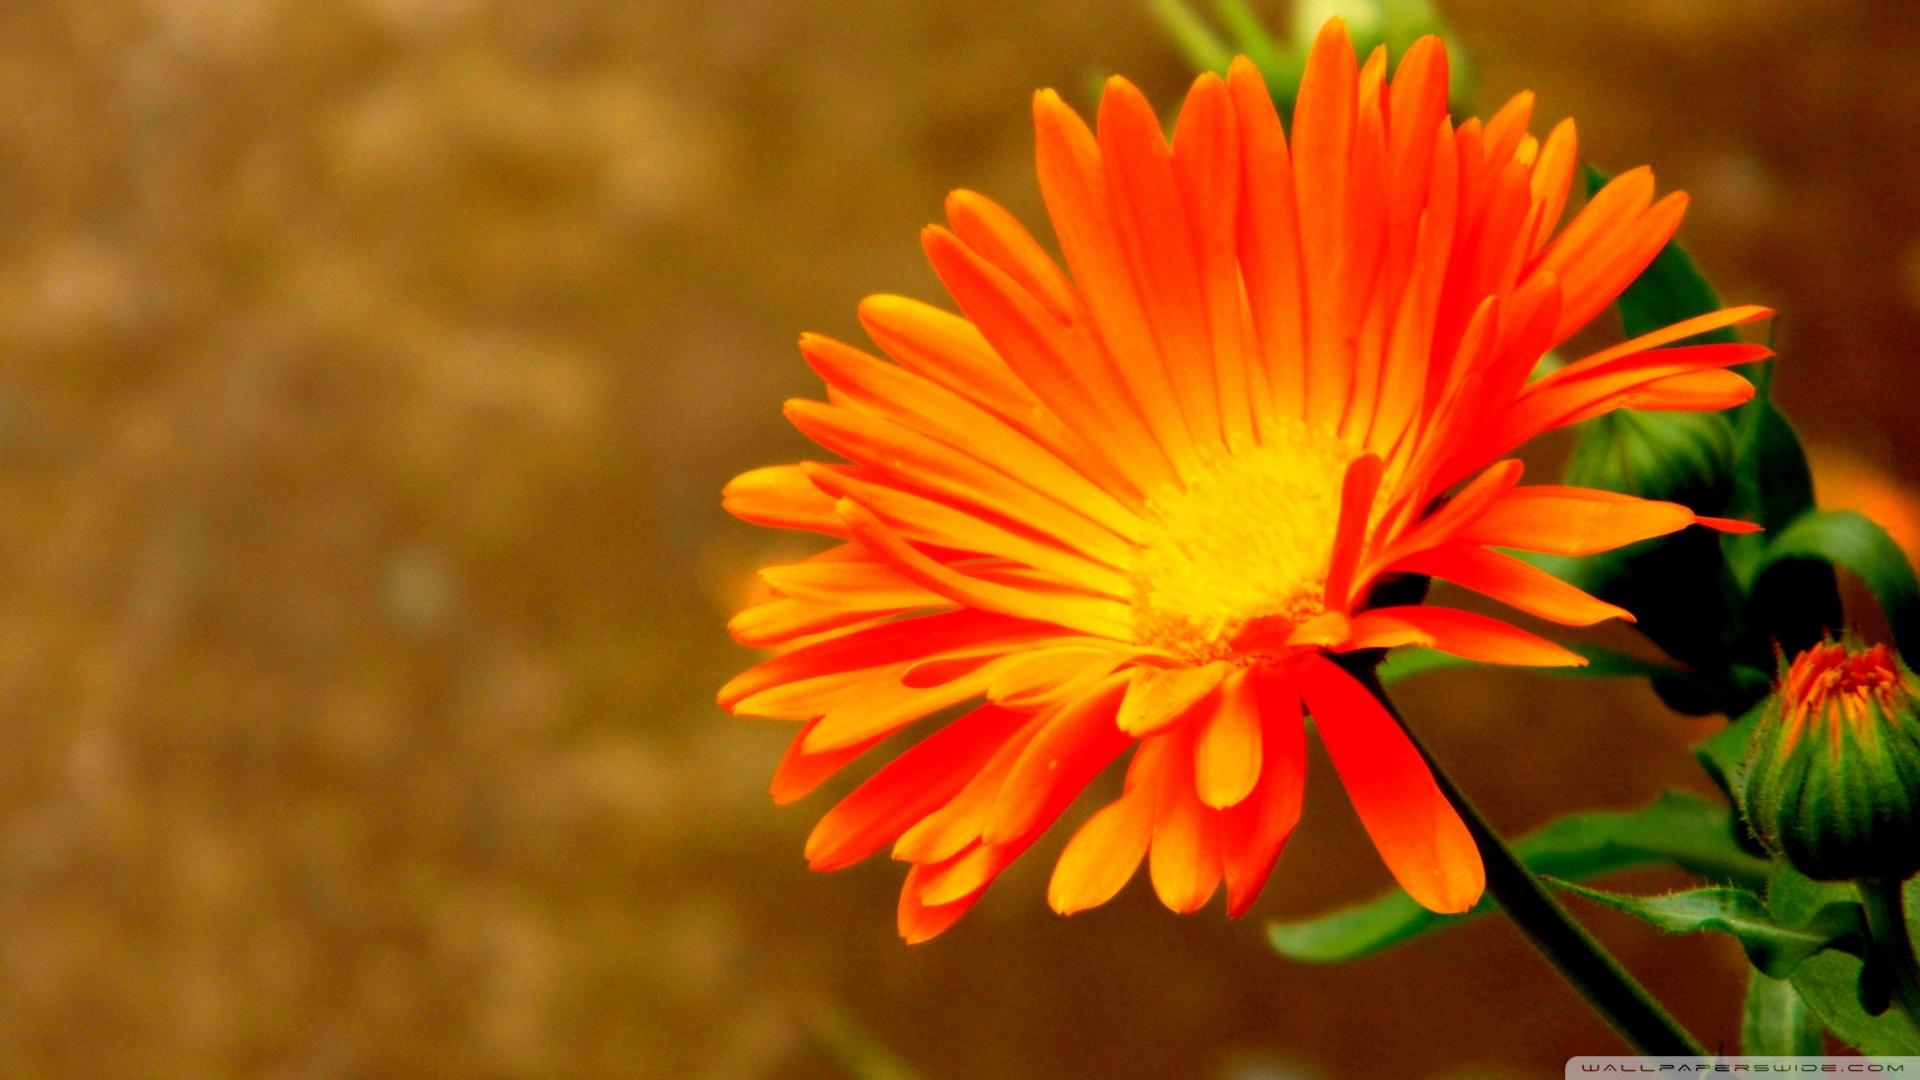 Orange Flower wallpaper   832783 1920x1080